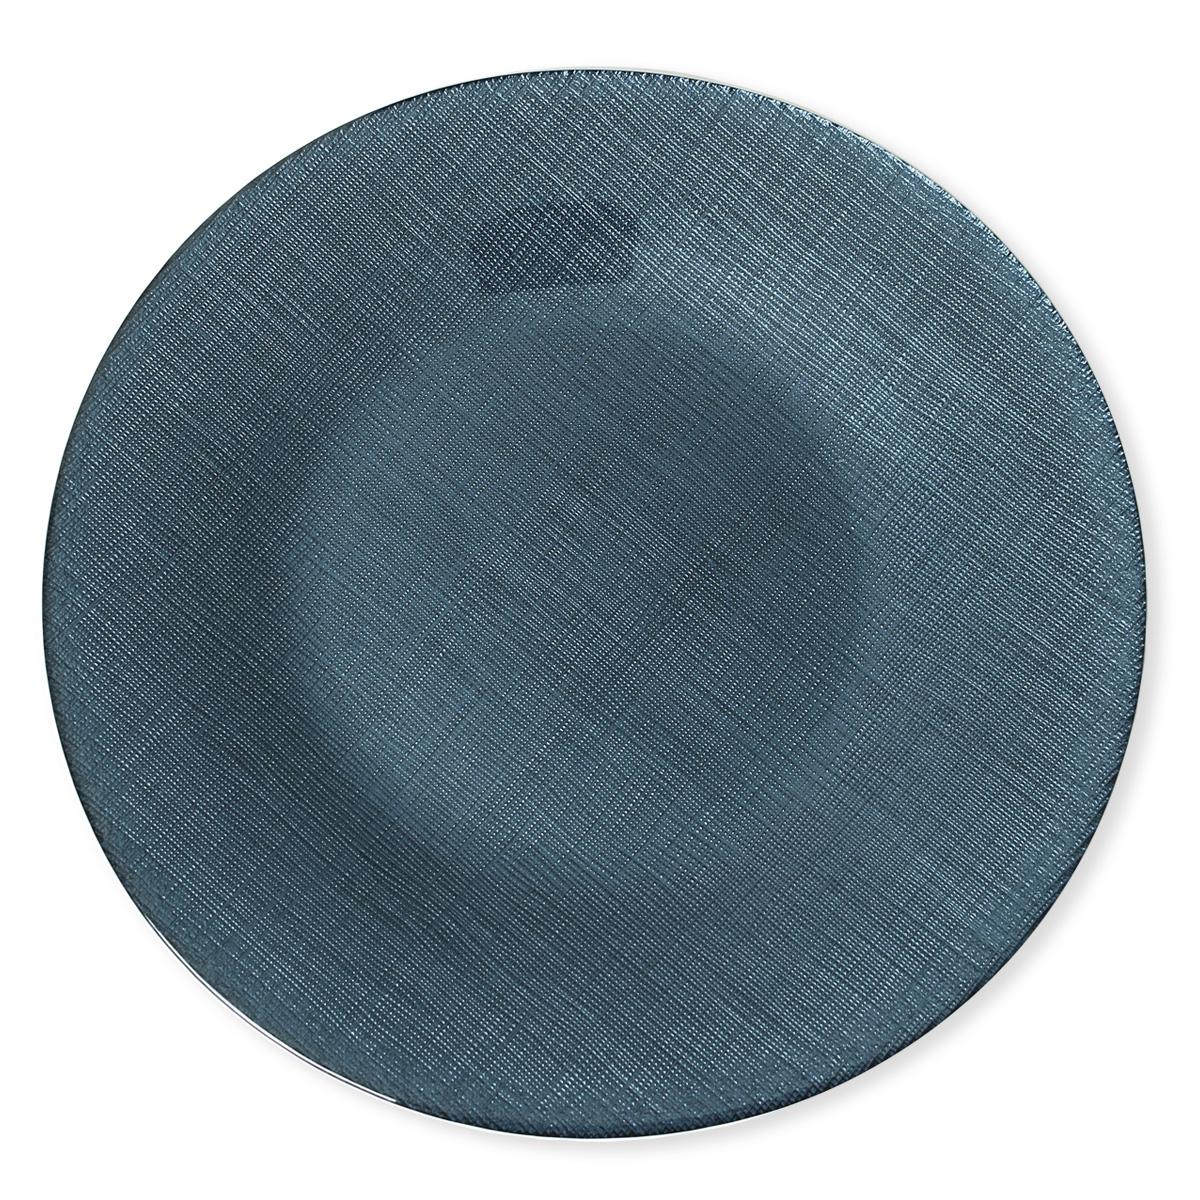 assiette plate en verre vaisselle chic et tendance bruno evrard. Black Bedroom Furniture Sets. Home Design Ideas